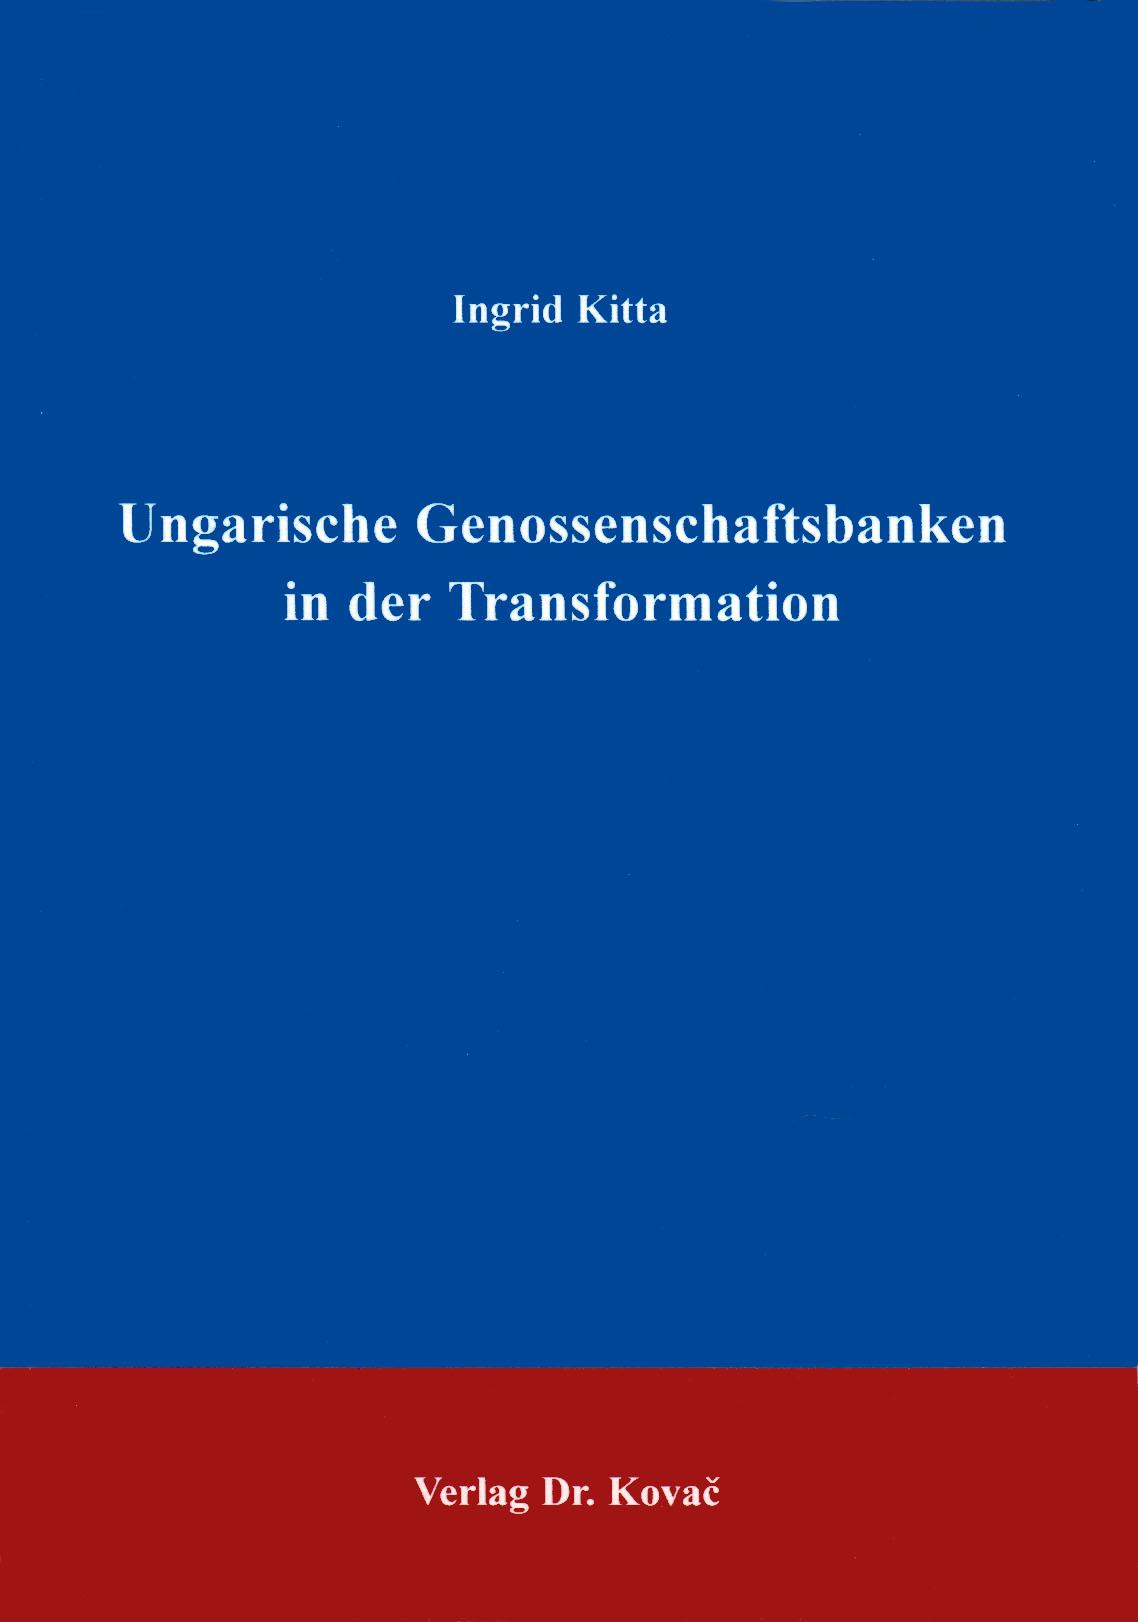 Cover: Ungarische Genossenschaftsbanken in der Transformation